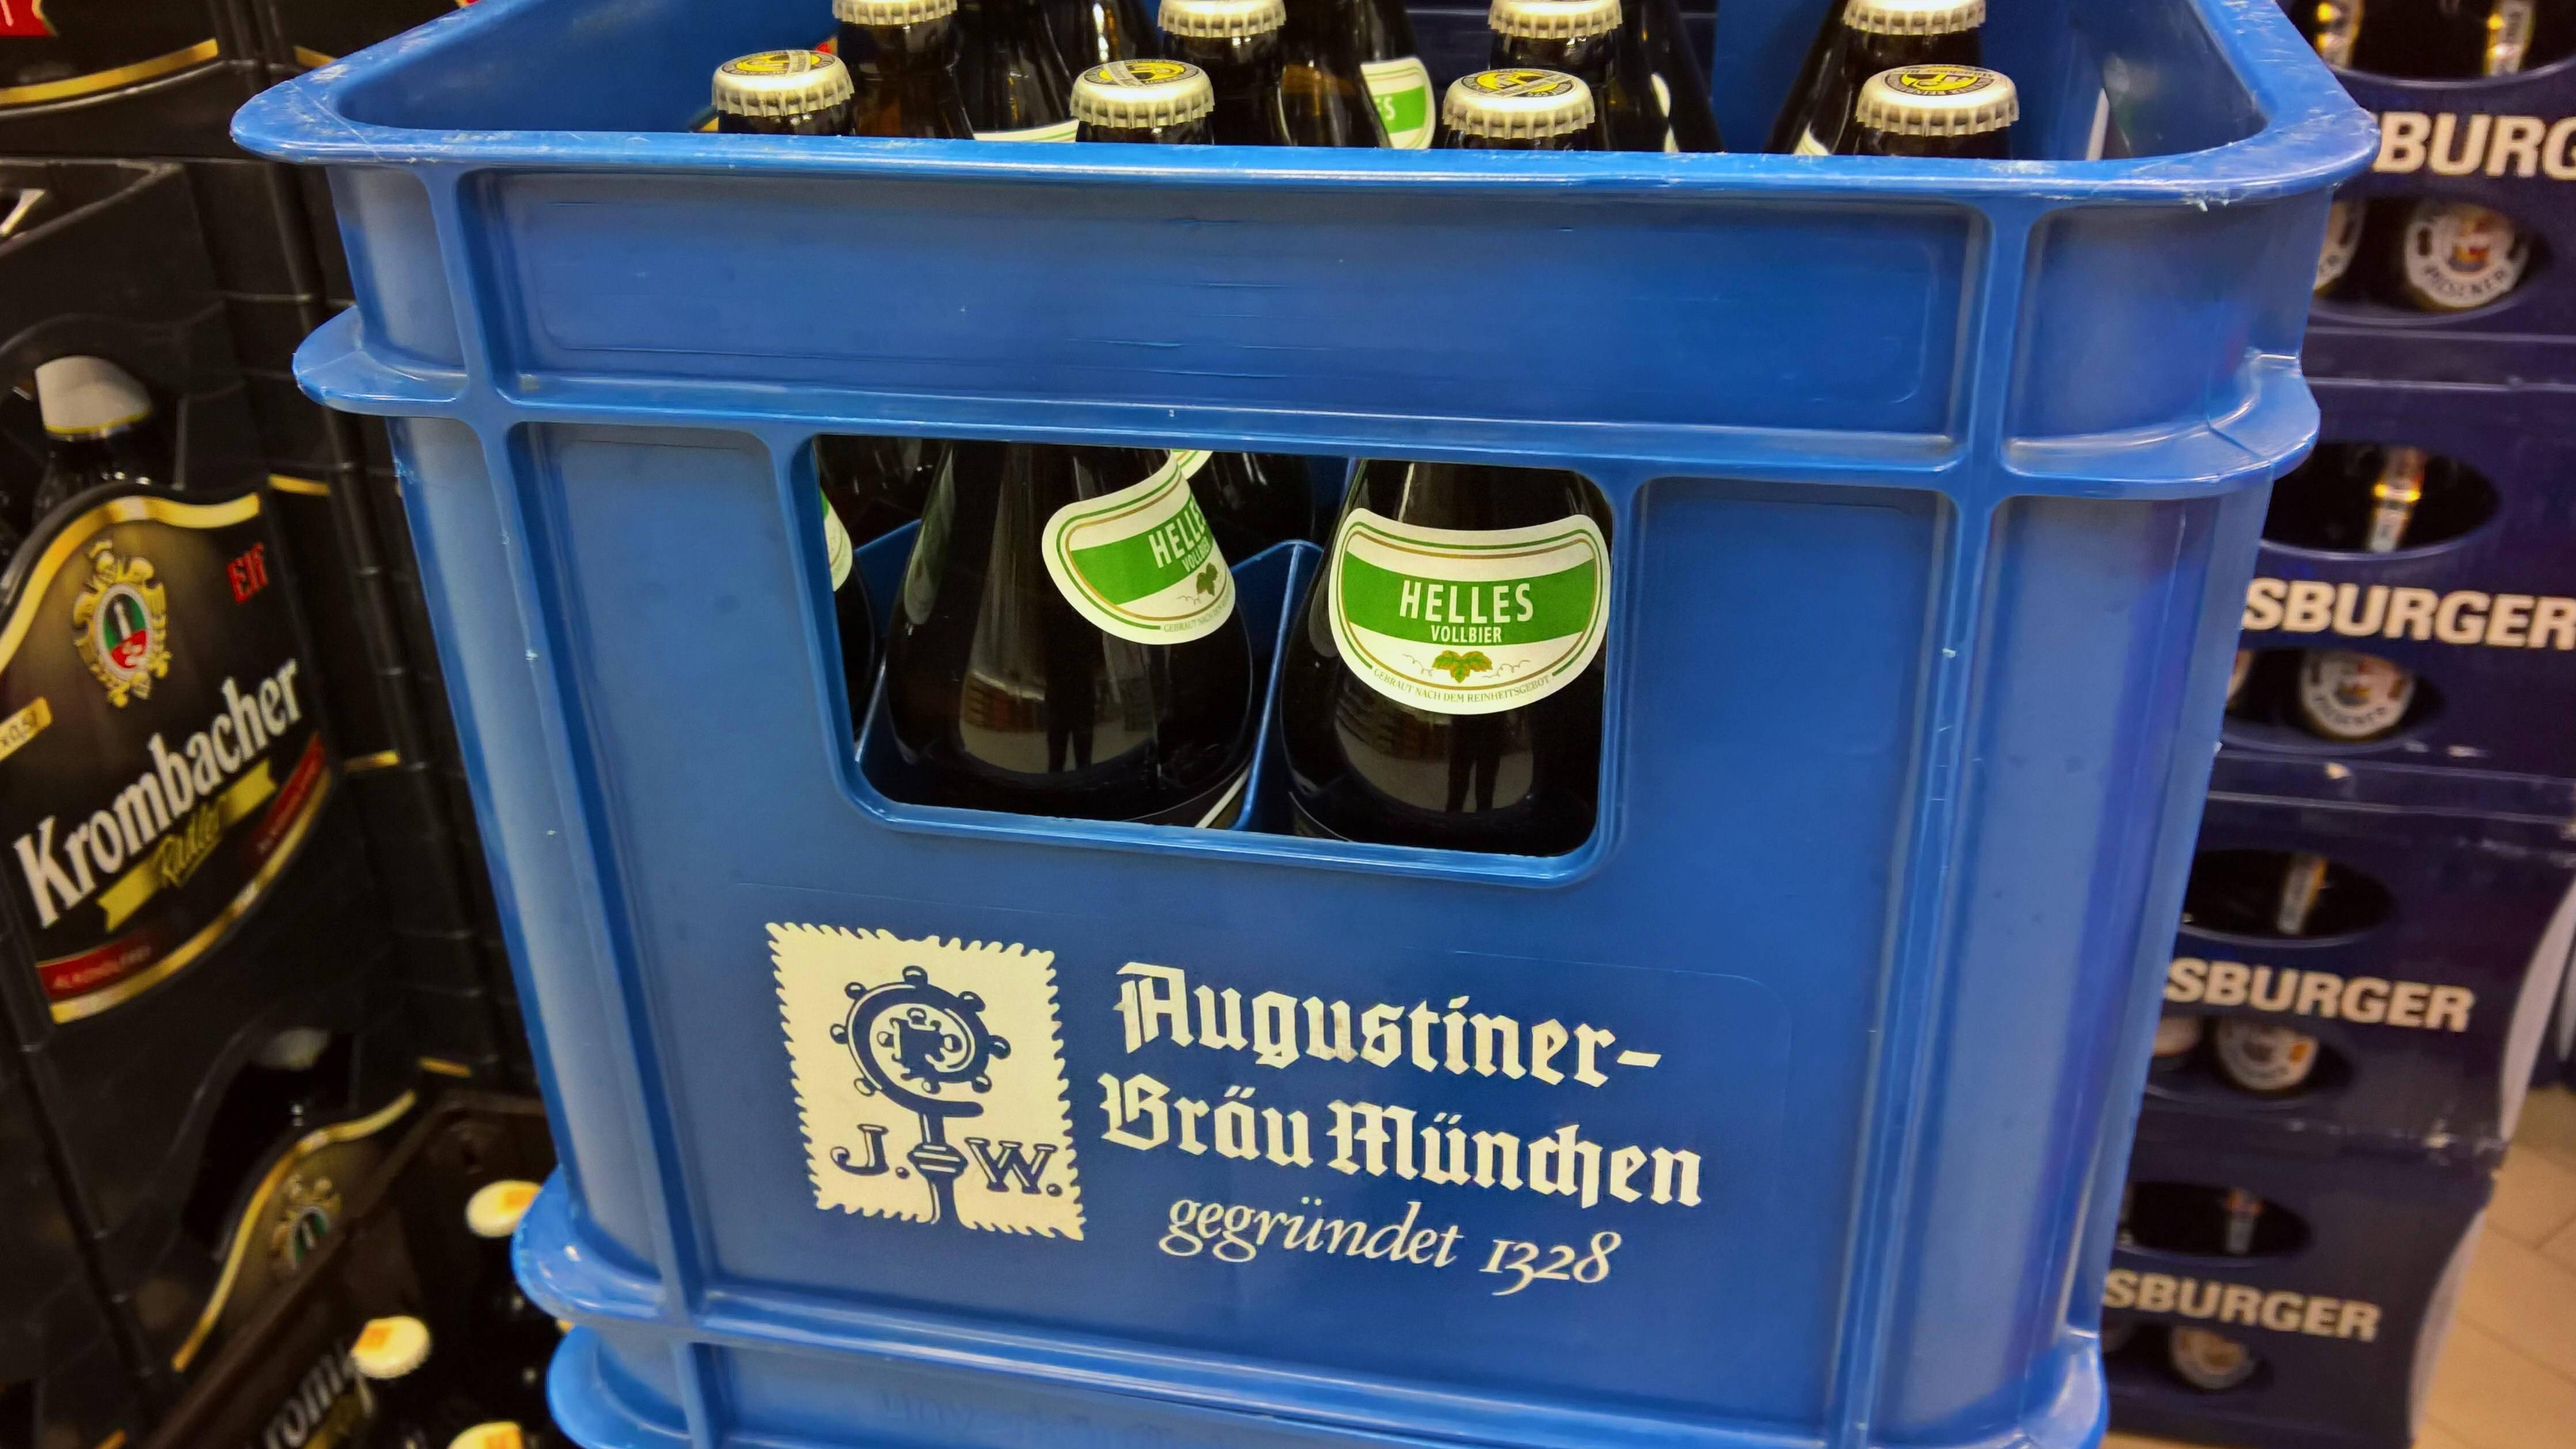 Abgelaufenes Bier ist meistens noch genießbar.